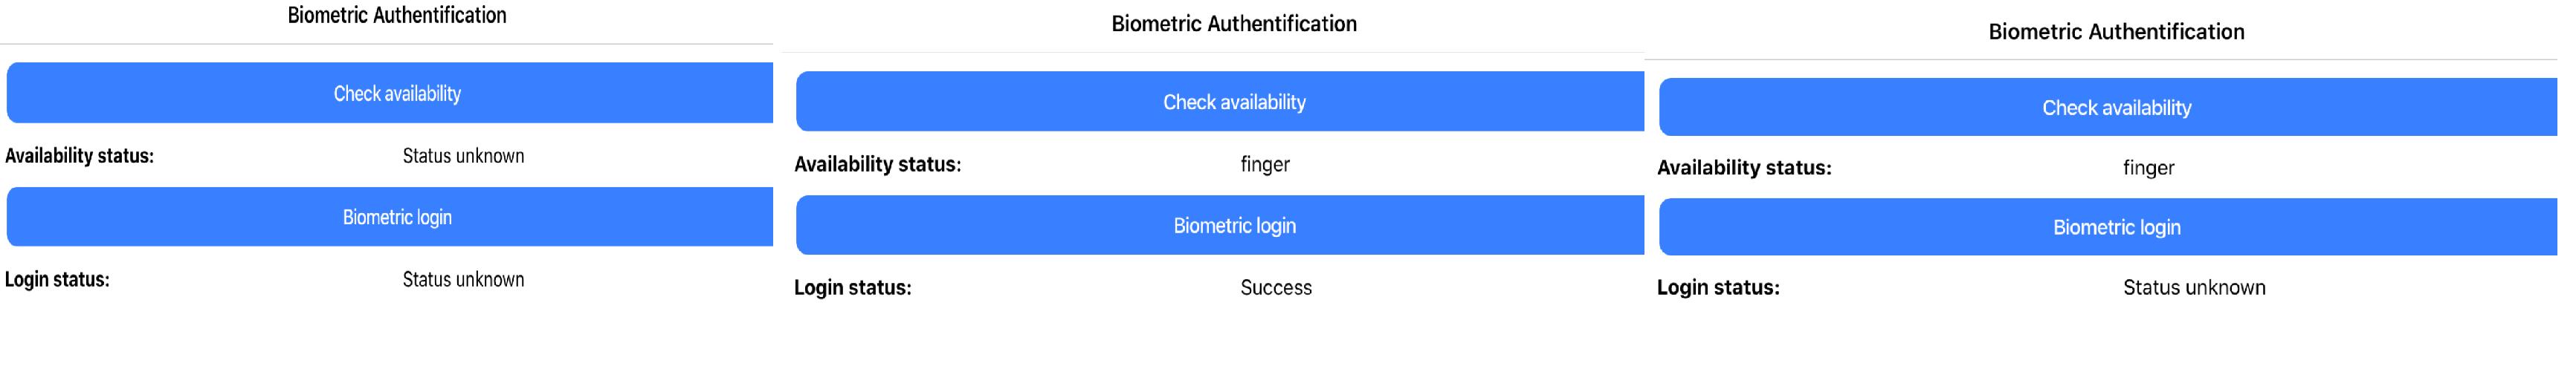 App work on iOS, Fingerprint authentication